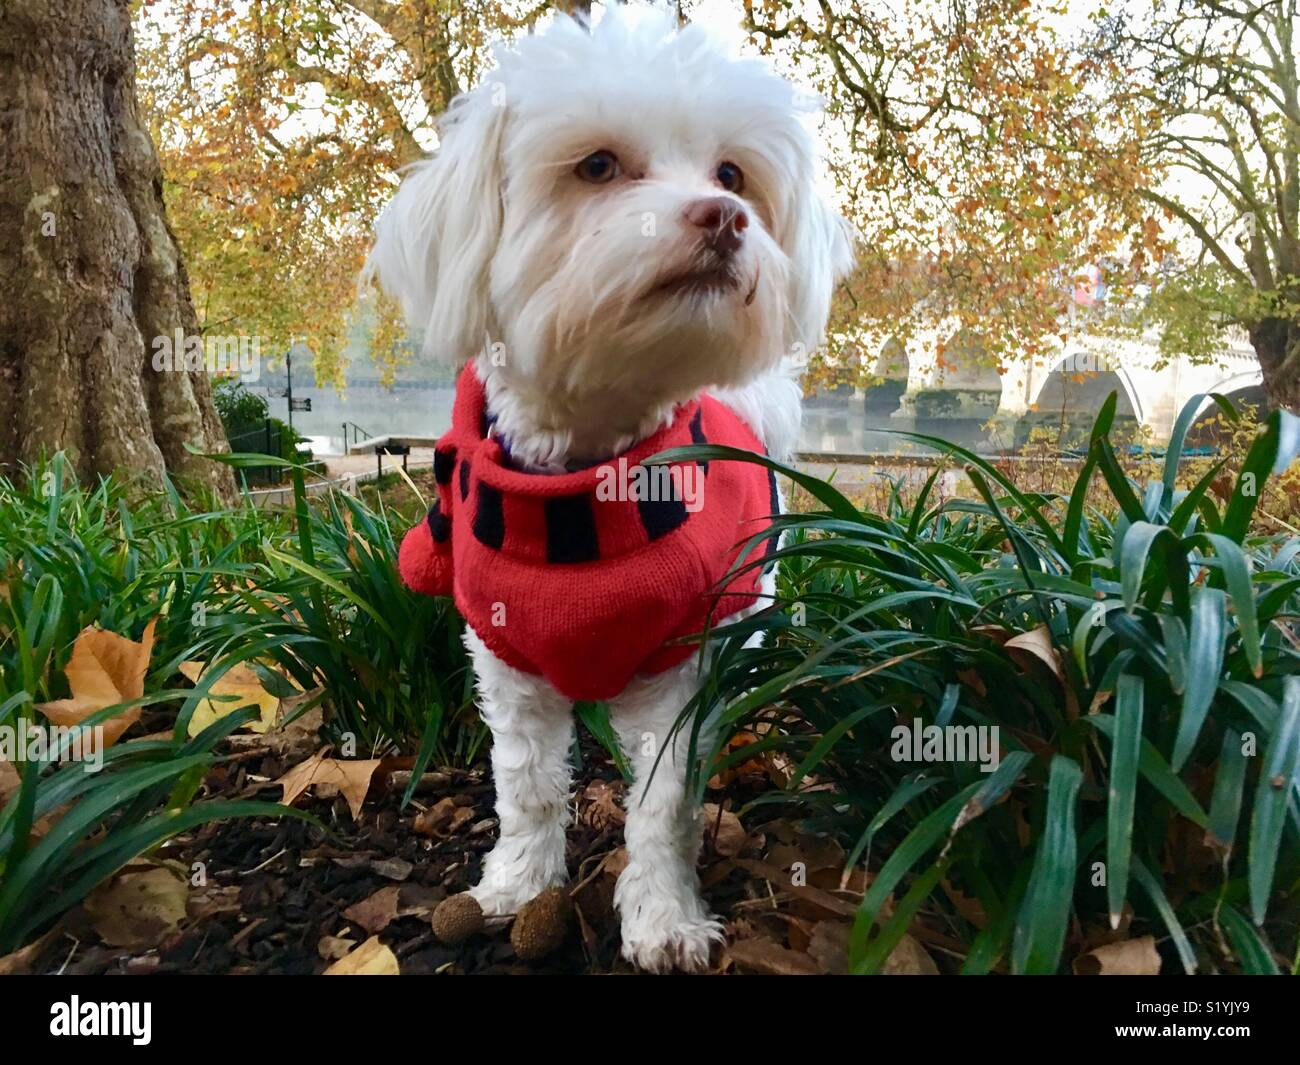 A small white mixed breed dog (Maltese - Shih Tsu) wearing a dog sweater on a cold morning at Richmond Upon Thames, London, England UK - Stock Image